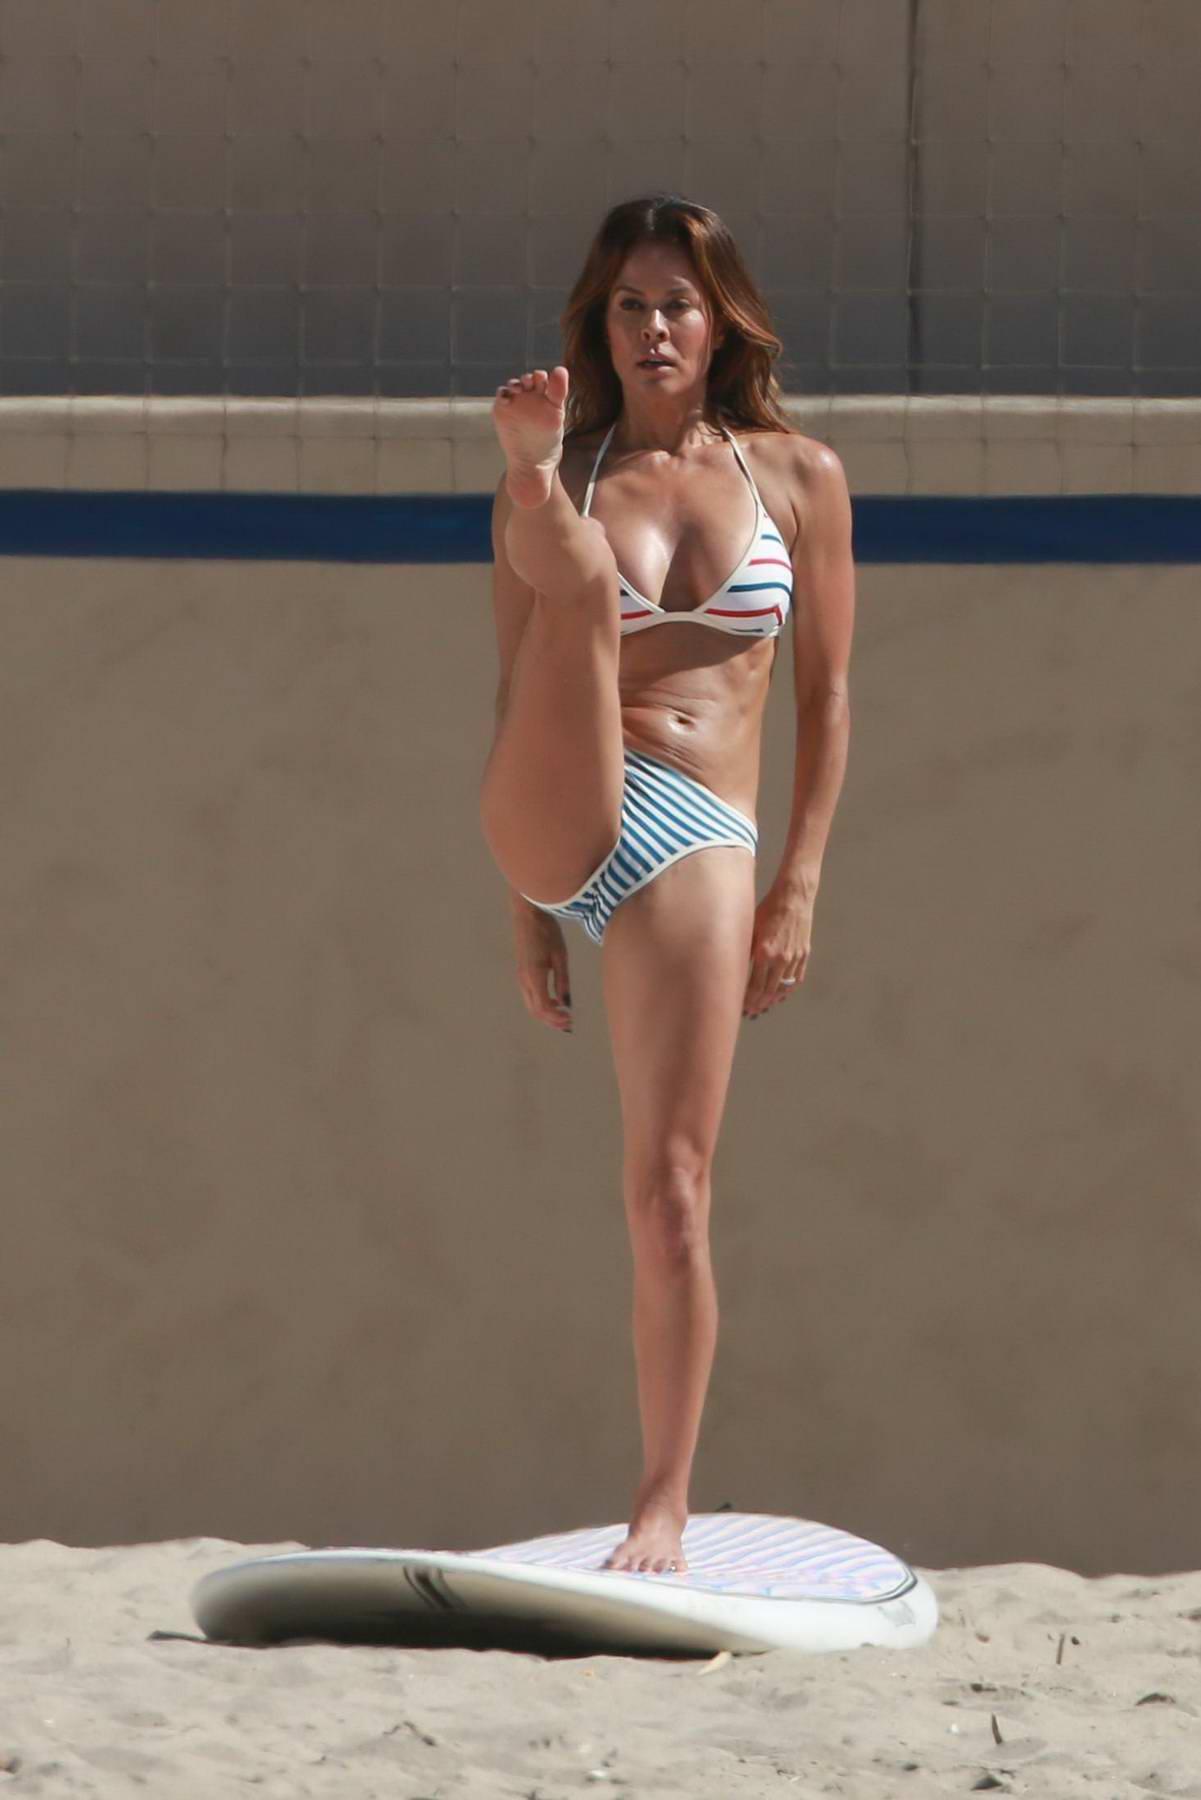 Brooke Burke in a striped bikini while filming a workout video on top of a surfboard in Malibu, California